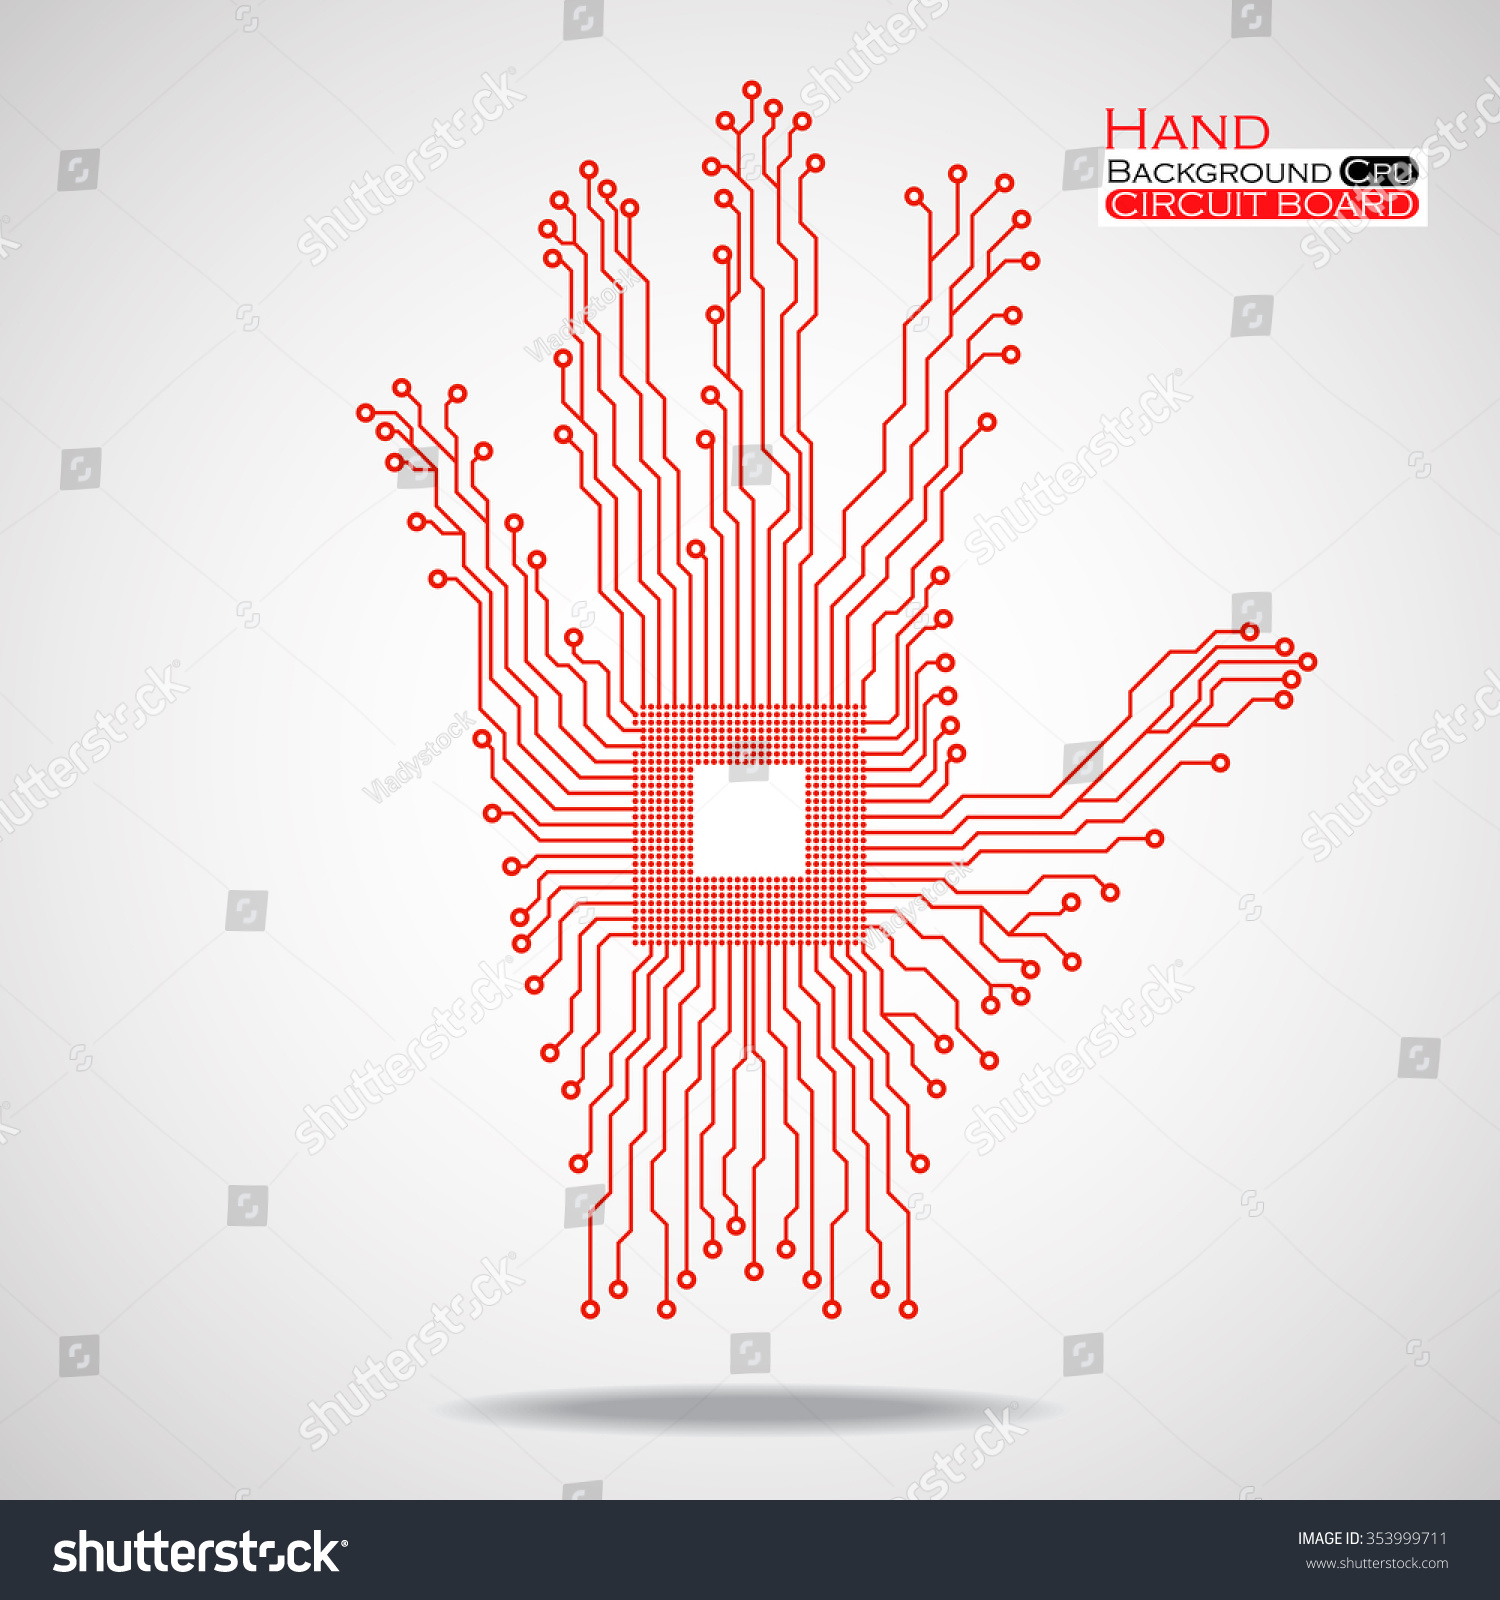 Hand Cpu Circuit Board Vector Illustration Stock Royalty Free Image Of Printed Sciencestockphotoscom Eps 10